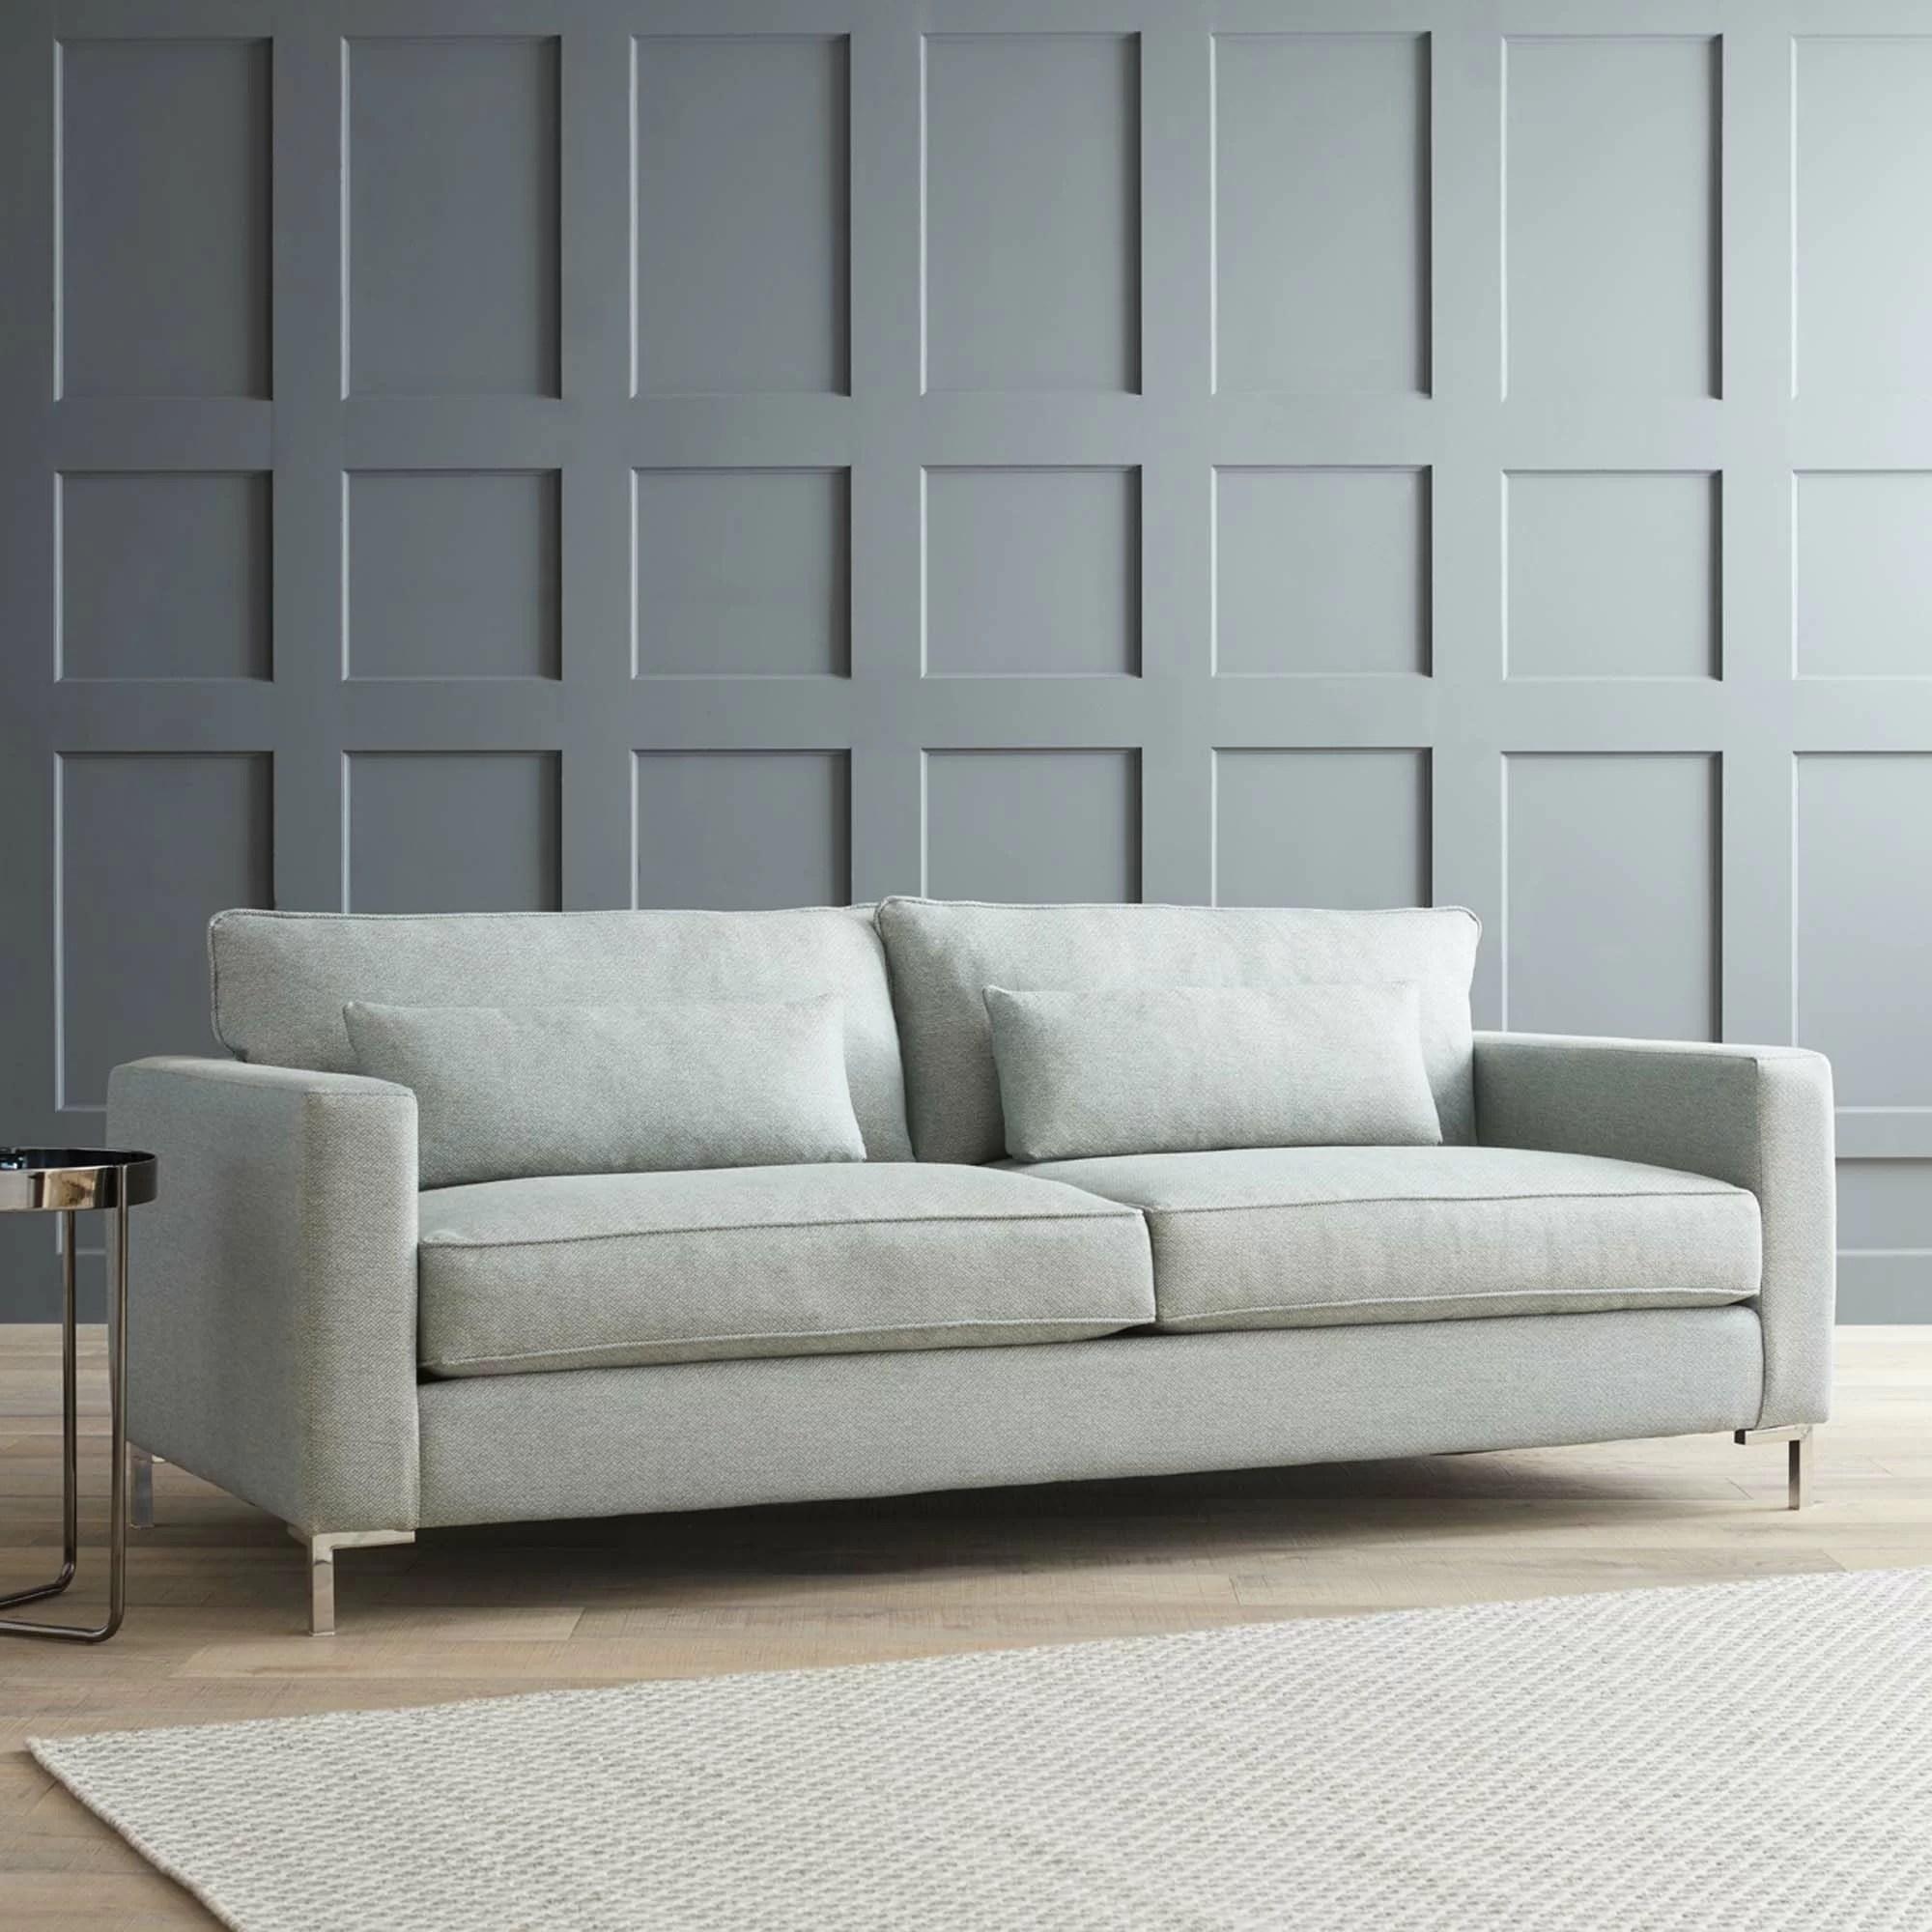 macy s spencer sofa reviews emily by abbyson living dwellstudio and wayfair